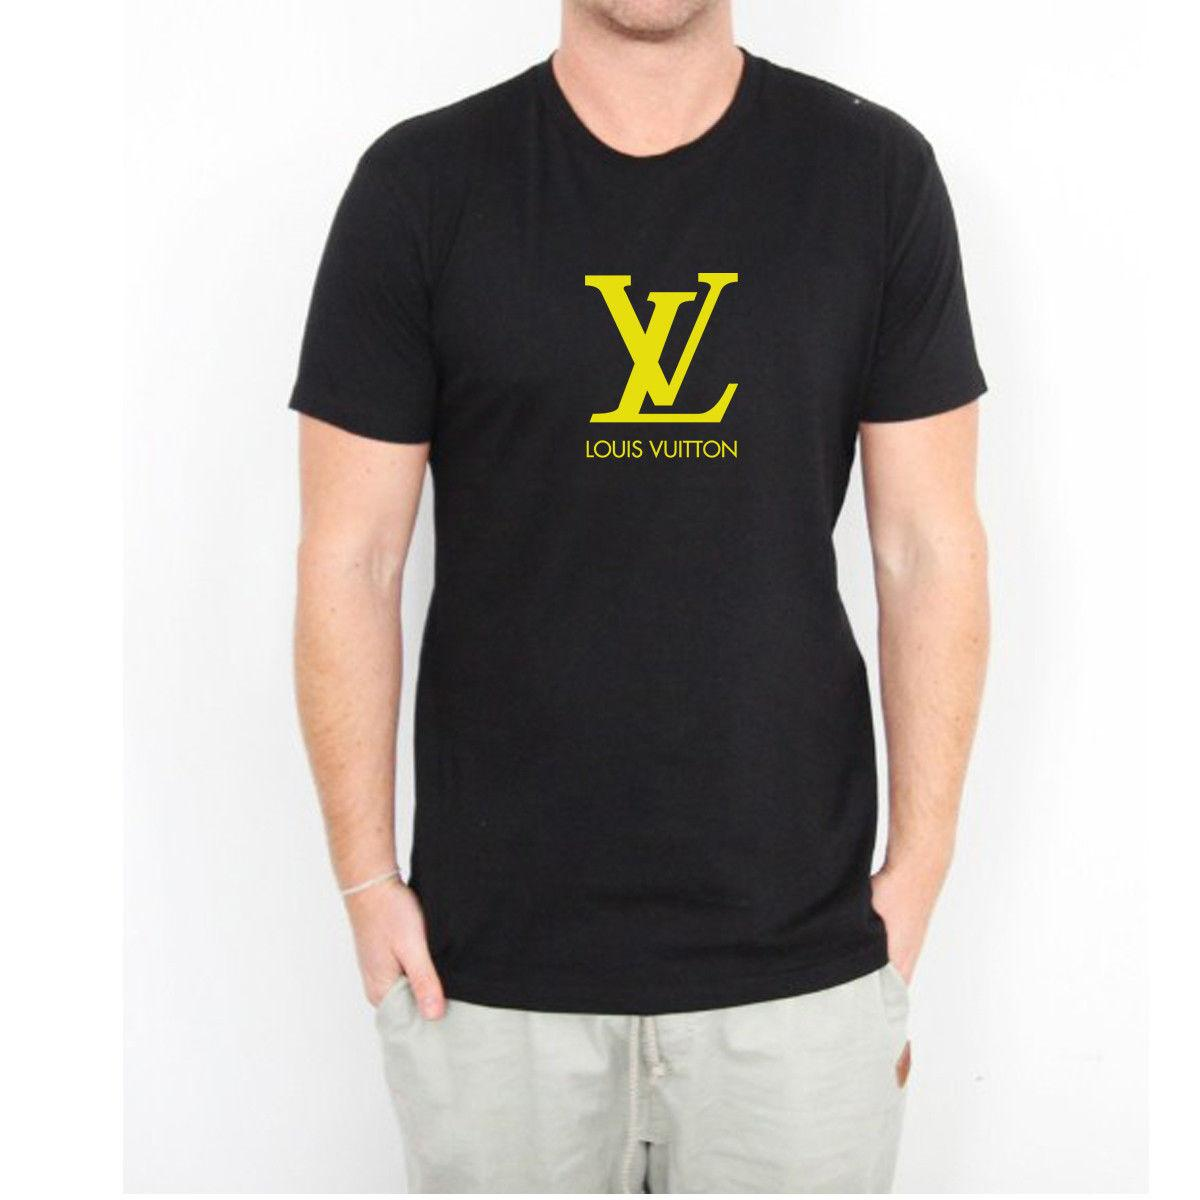 d6b1ca5eb Compre Logotipo De Luis Vonsi Amarillo Famosa Marca De Moda Hombre Negro  Camiseta Talla S M L XL Luis Volición Camiseta De Moda Unisex Casual Hombre  ...